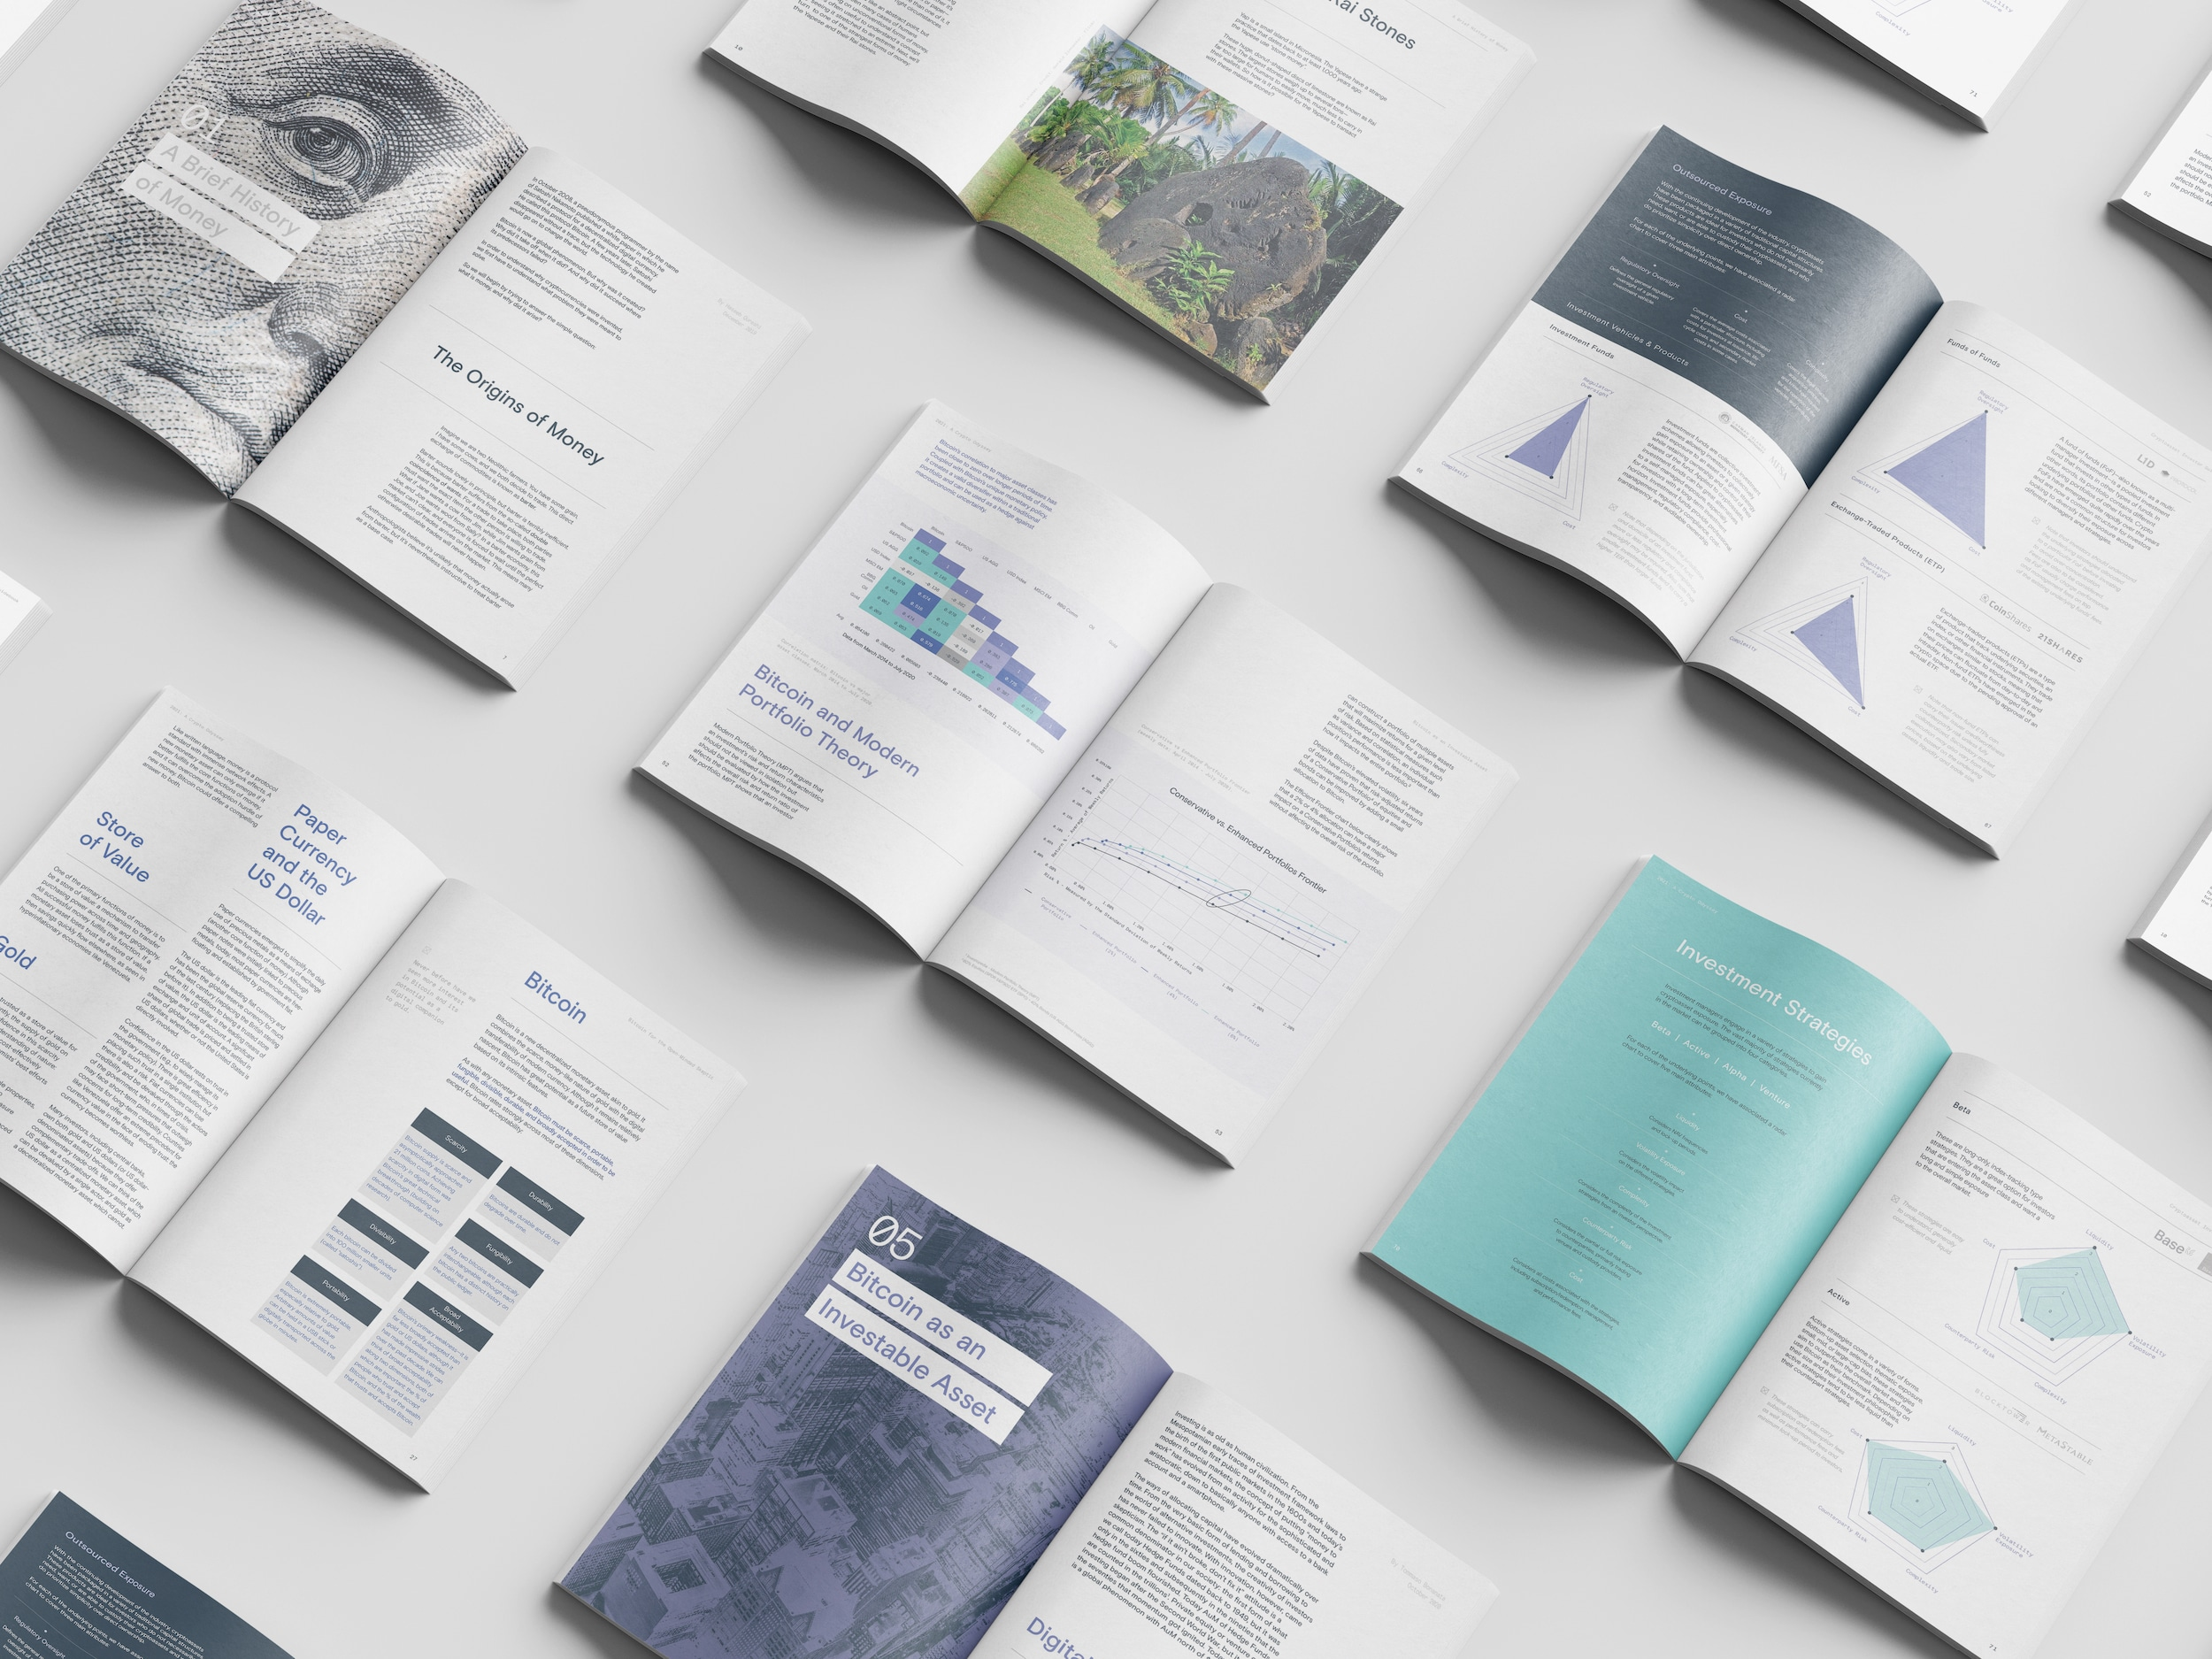 mimosa - brand consultancy - digital marketing agency - creative studio - Zürich - Product design